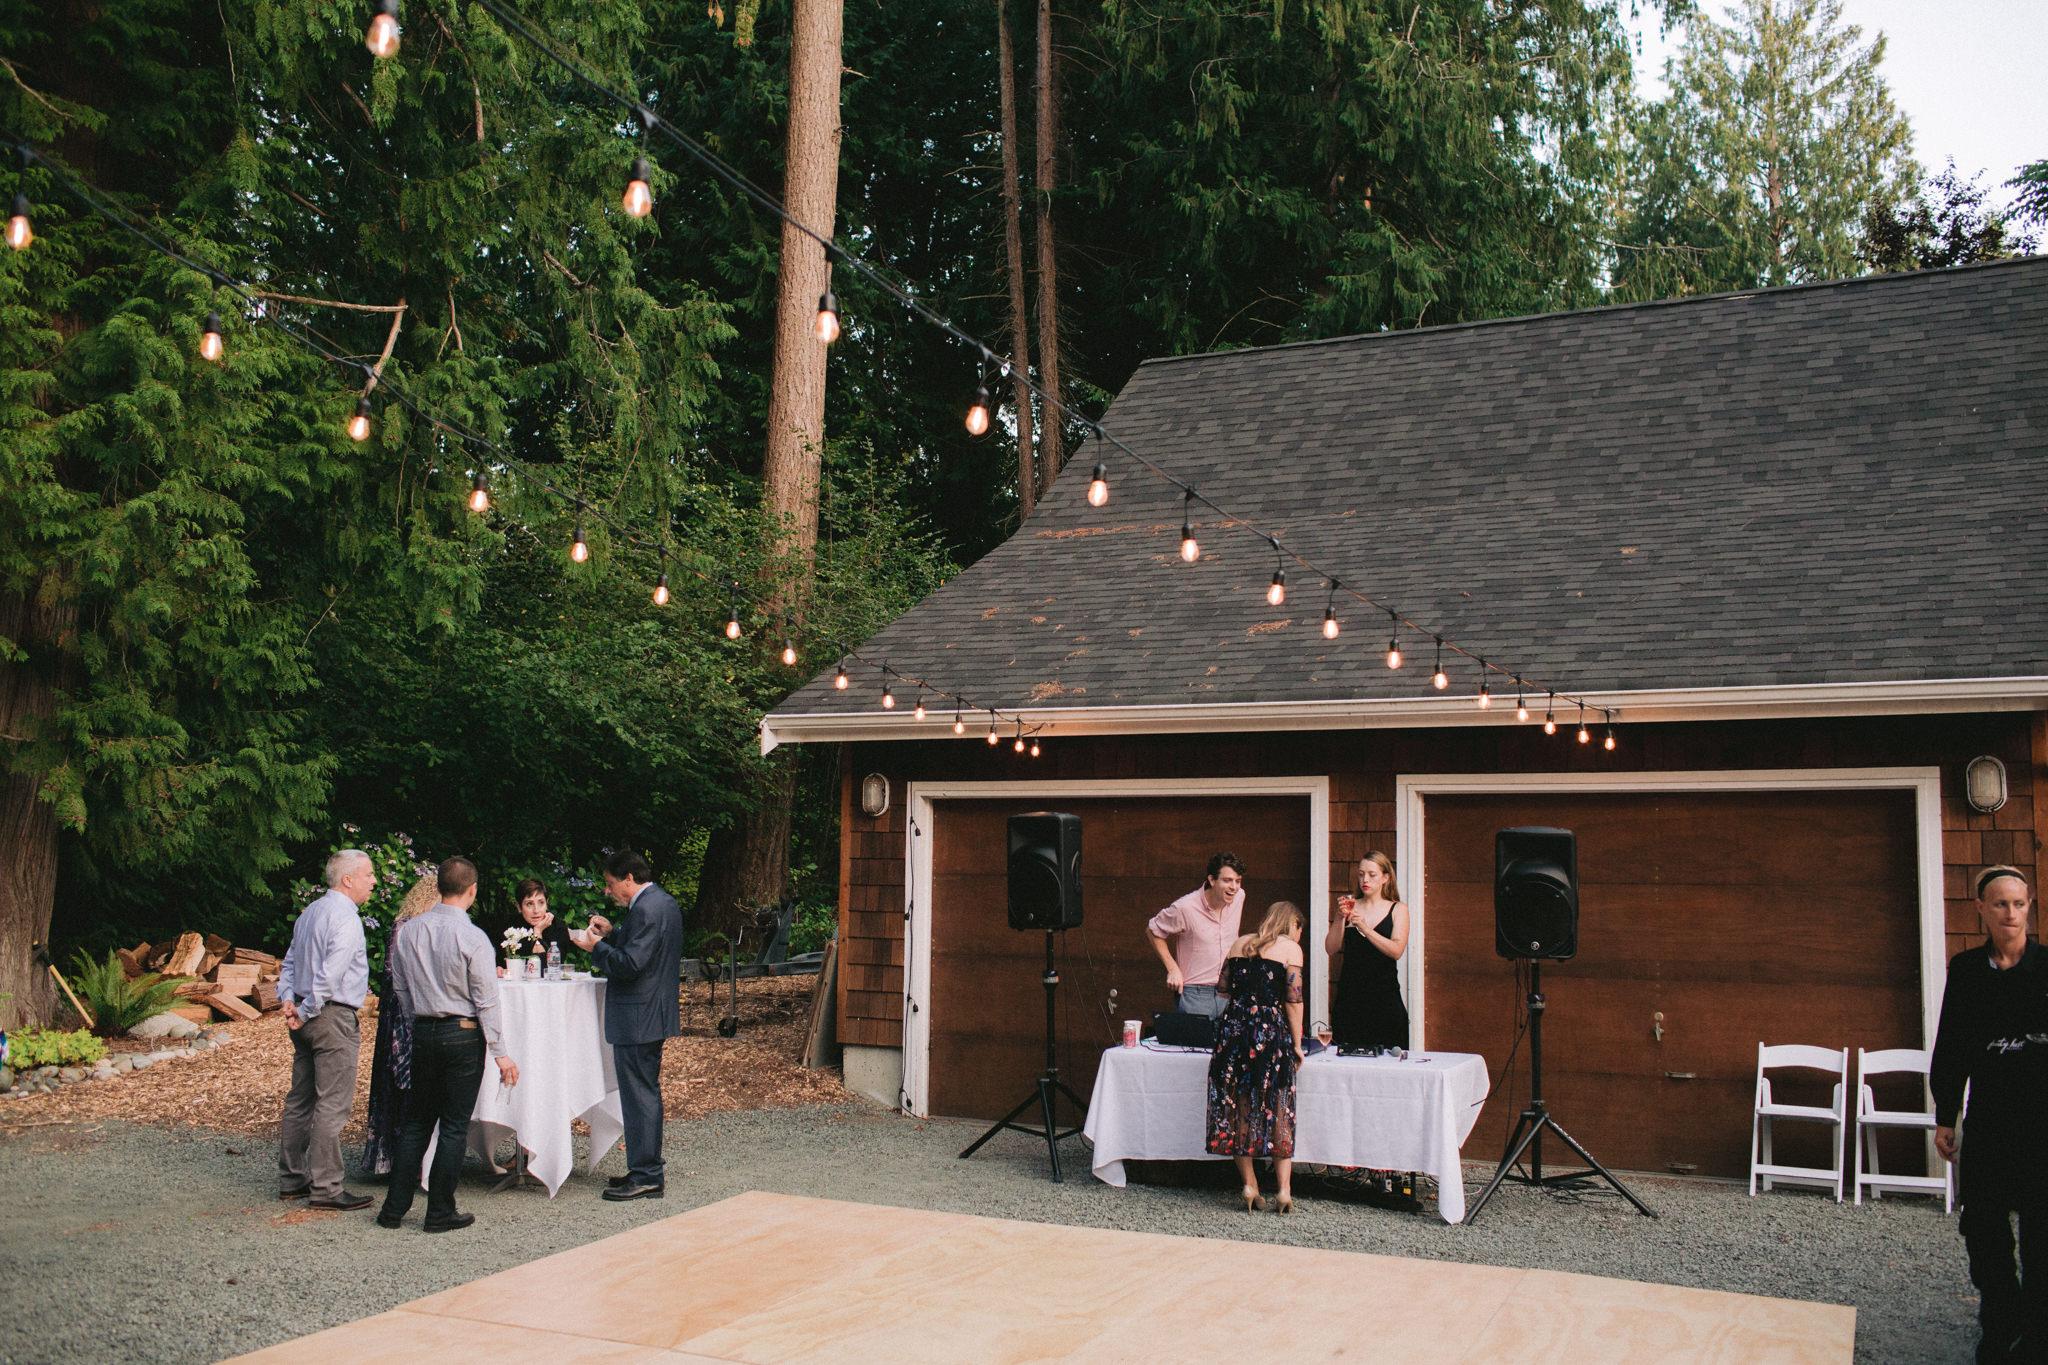 Backyard-Bainbridge-Island-Wedding-Alycia-Lovell-Photography-177.JPG